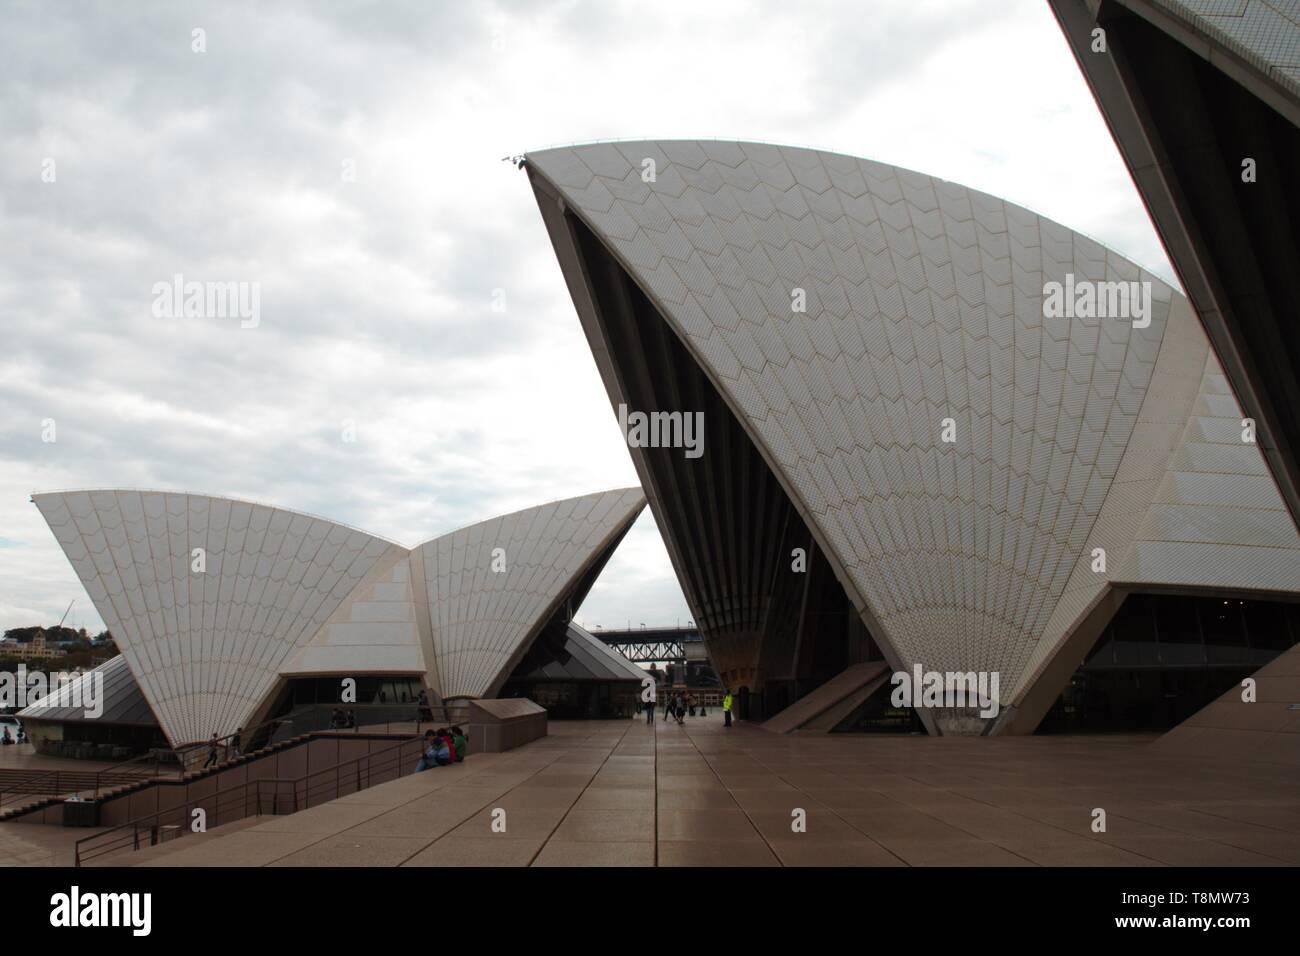 White impressive Sydney opera house – Typical view - Stock Image